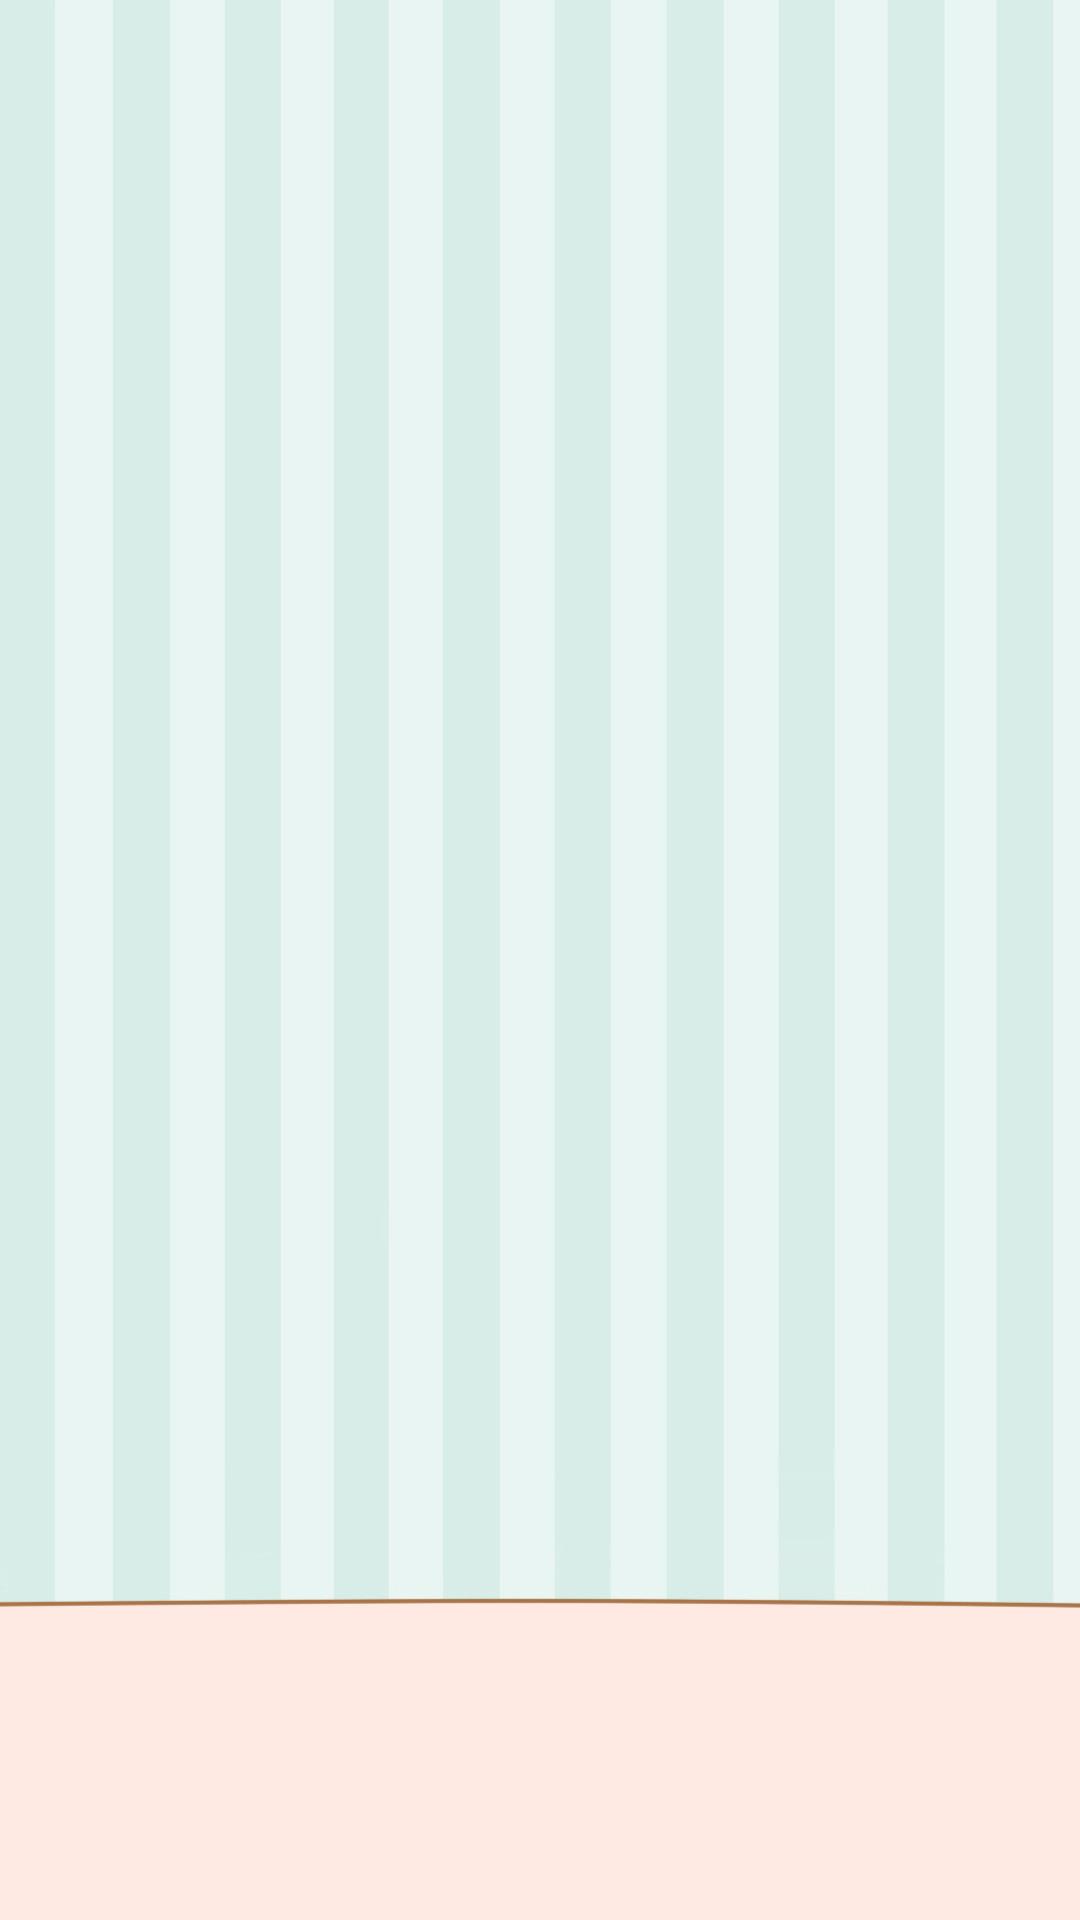 Res: 1080x1920, cute kawaii wallpaper phone background phone wallpaper  sweetlookinwalls.tumblr.com